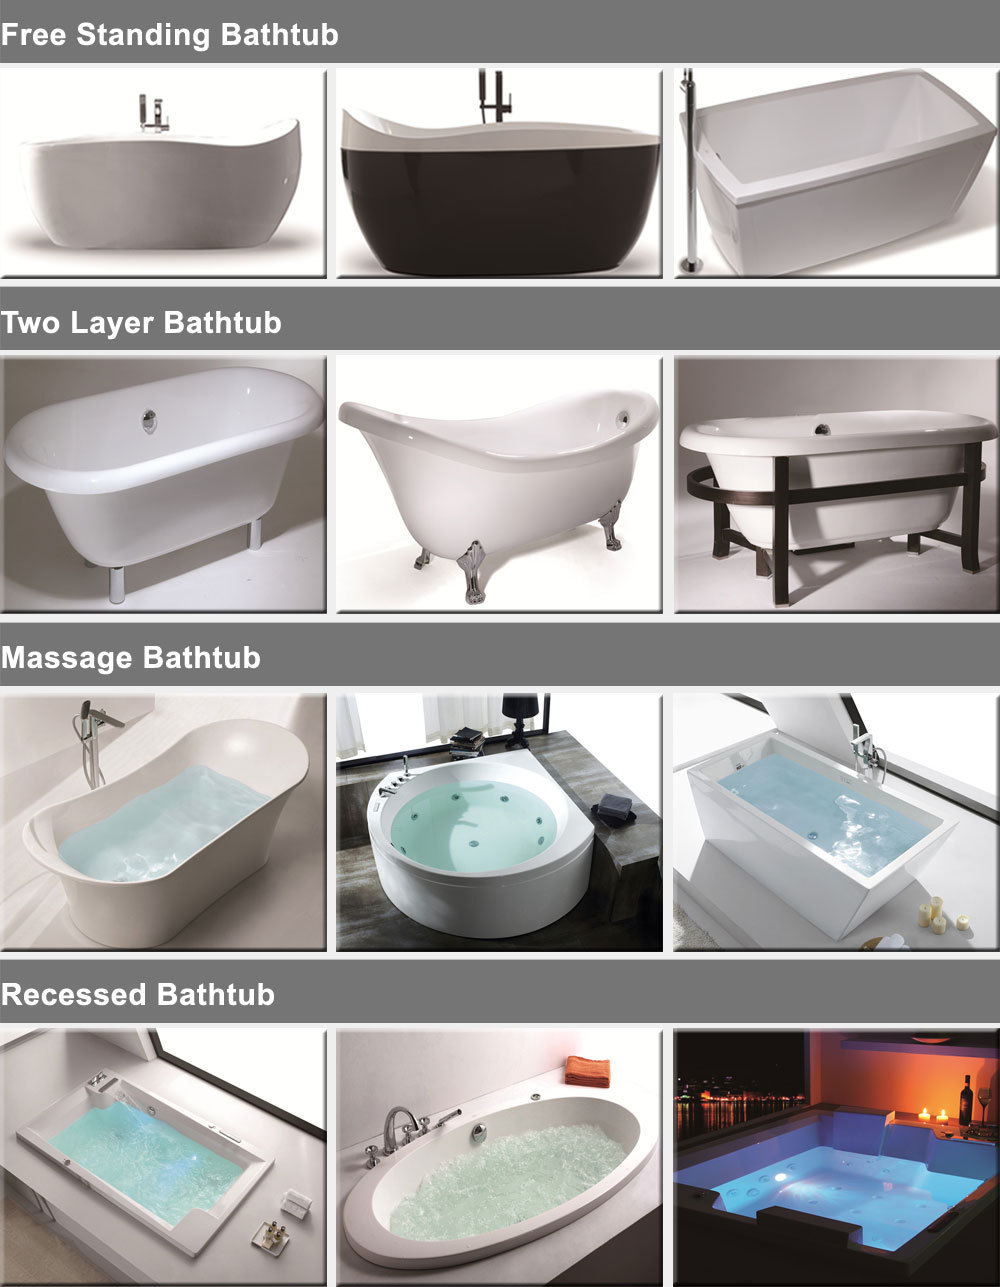 Europe Best Seller Whirlpool Bathtub /spa Whirlpool Bath Tub ...